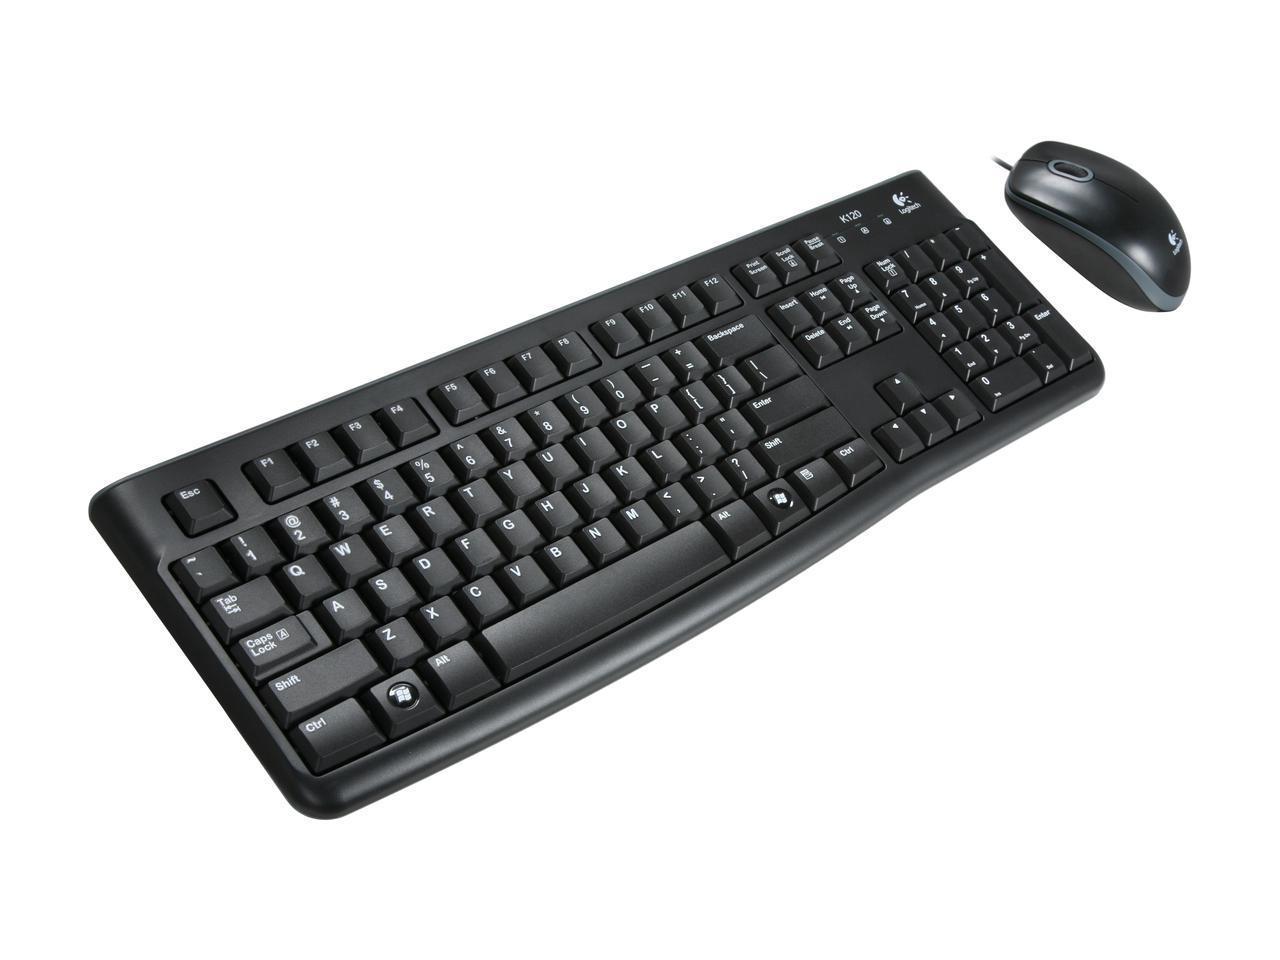 Logitech Keyboards and Mice